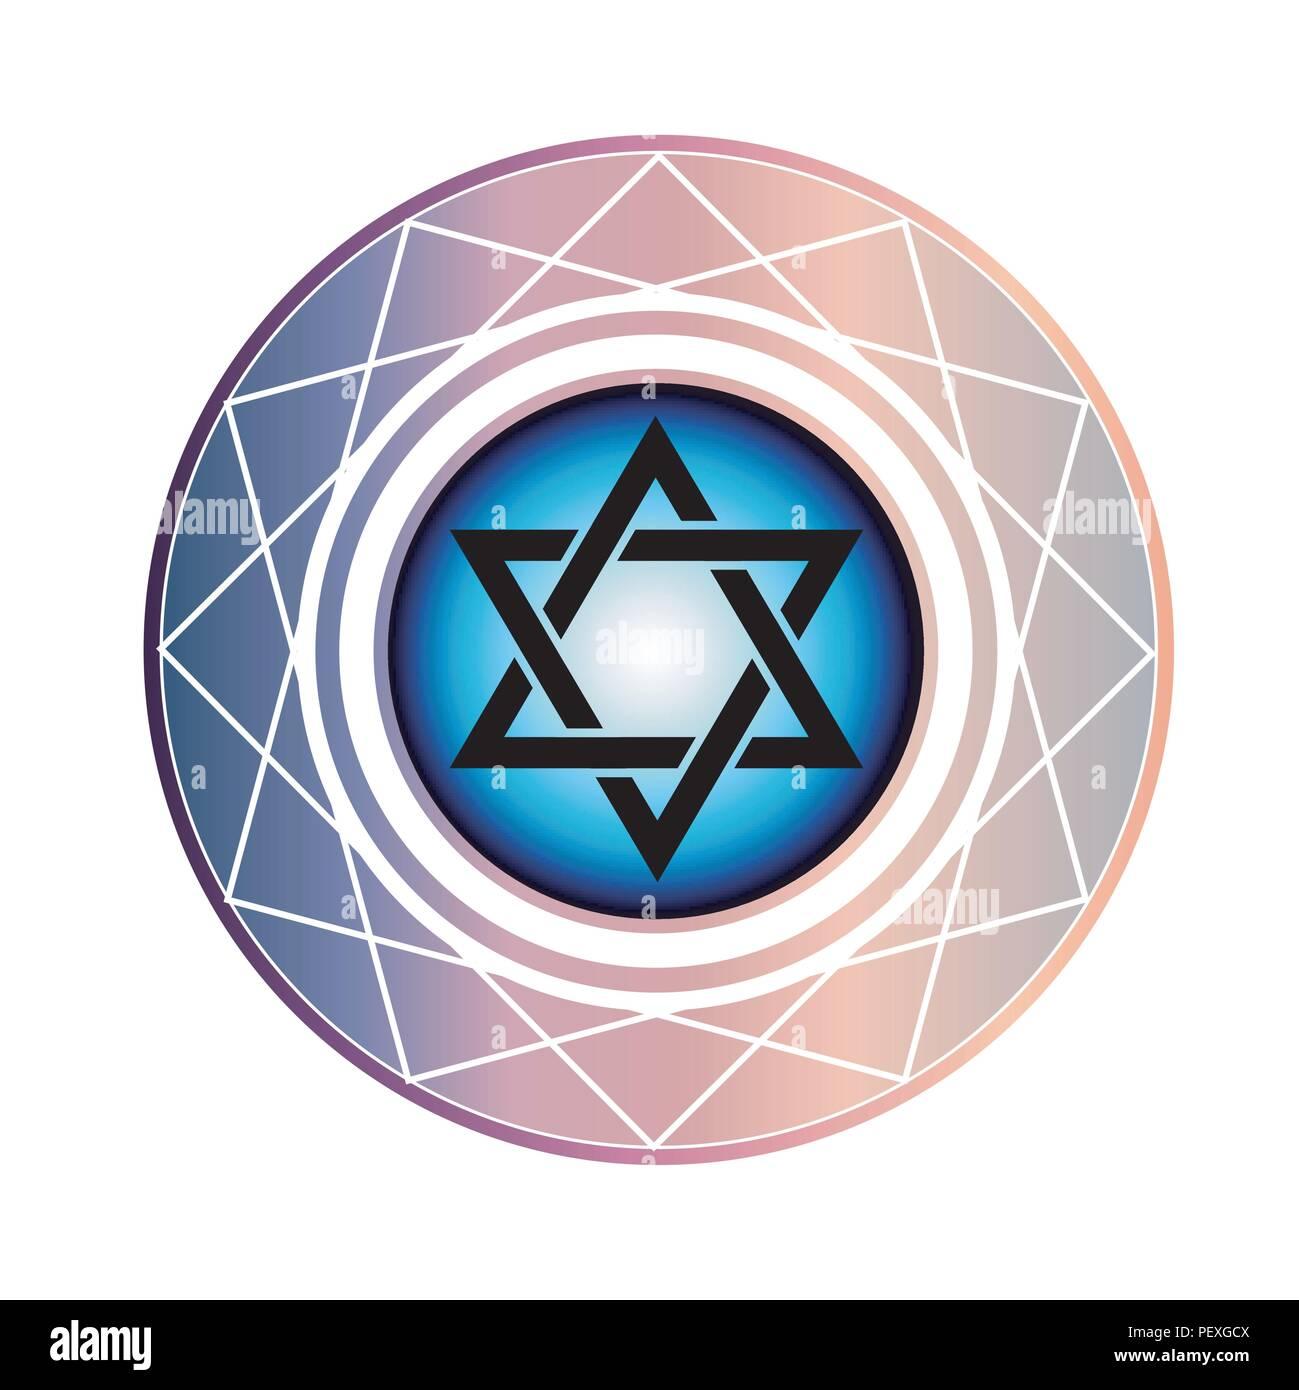 Jewish Star of David - Stock Image